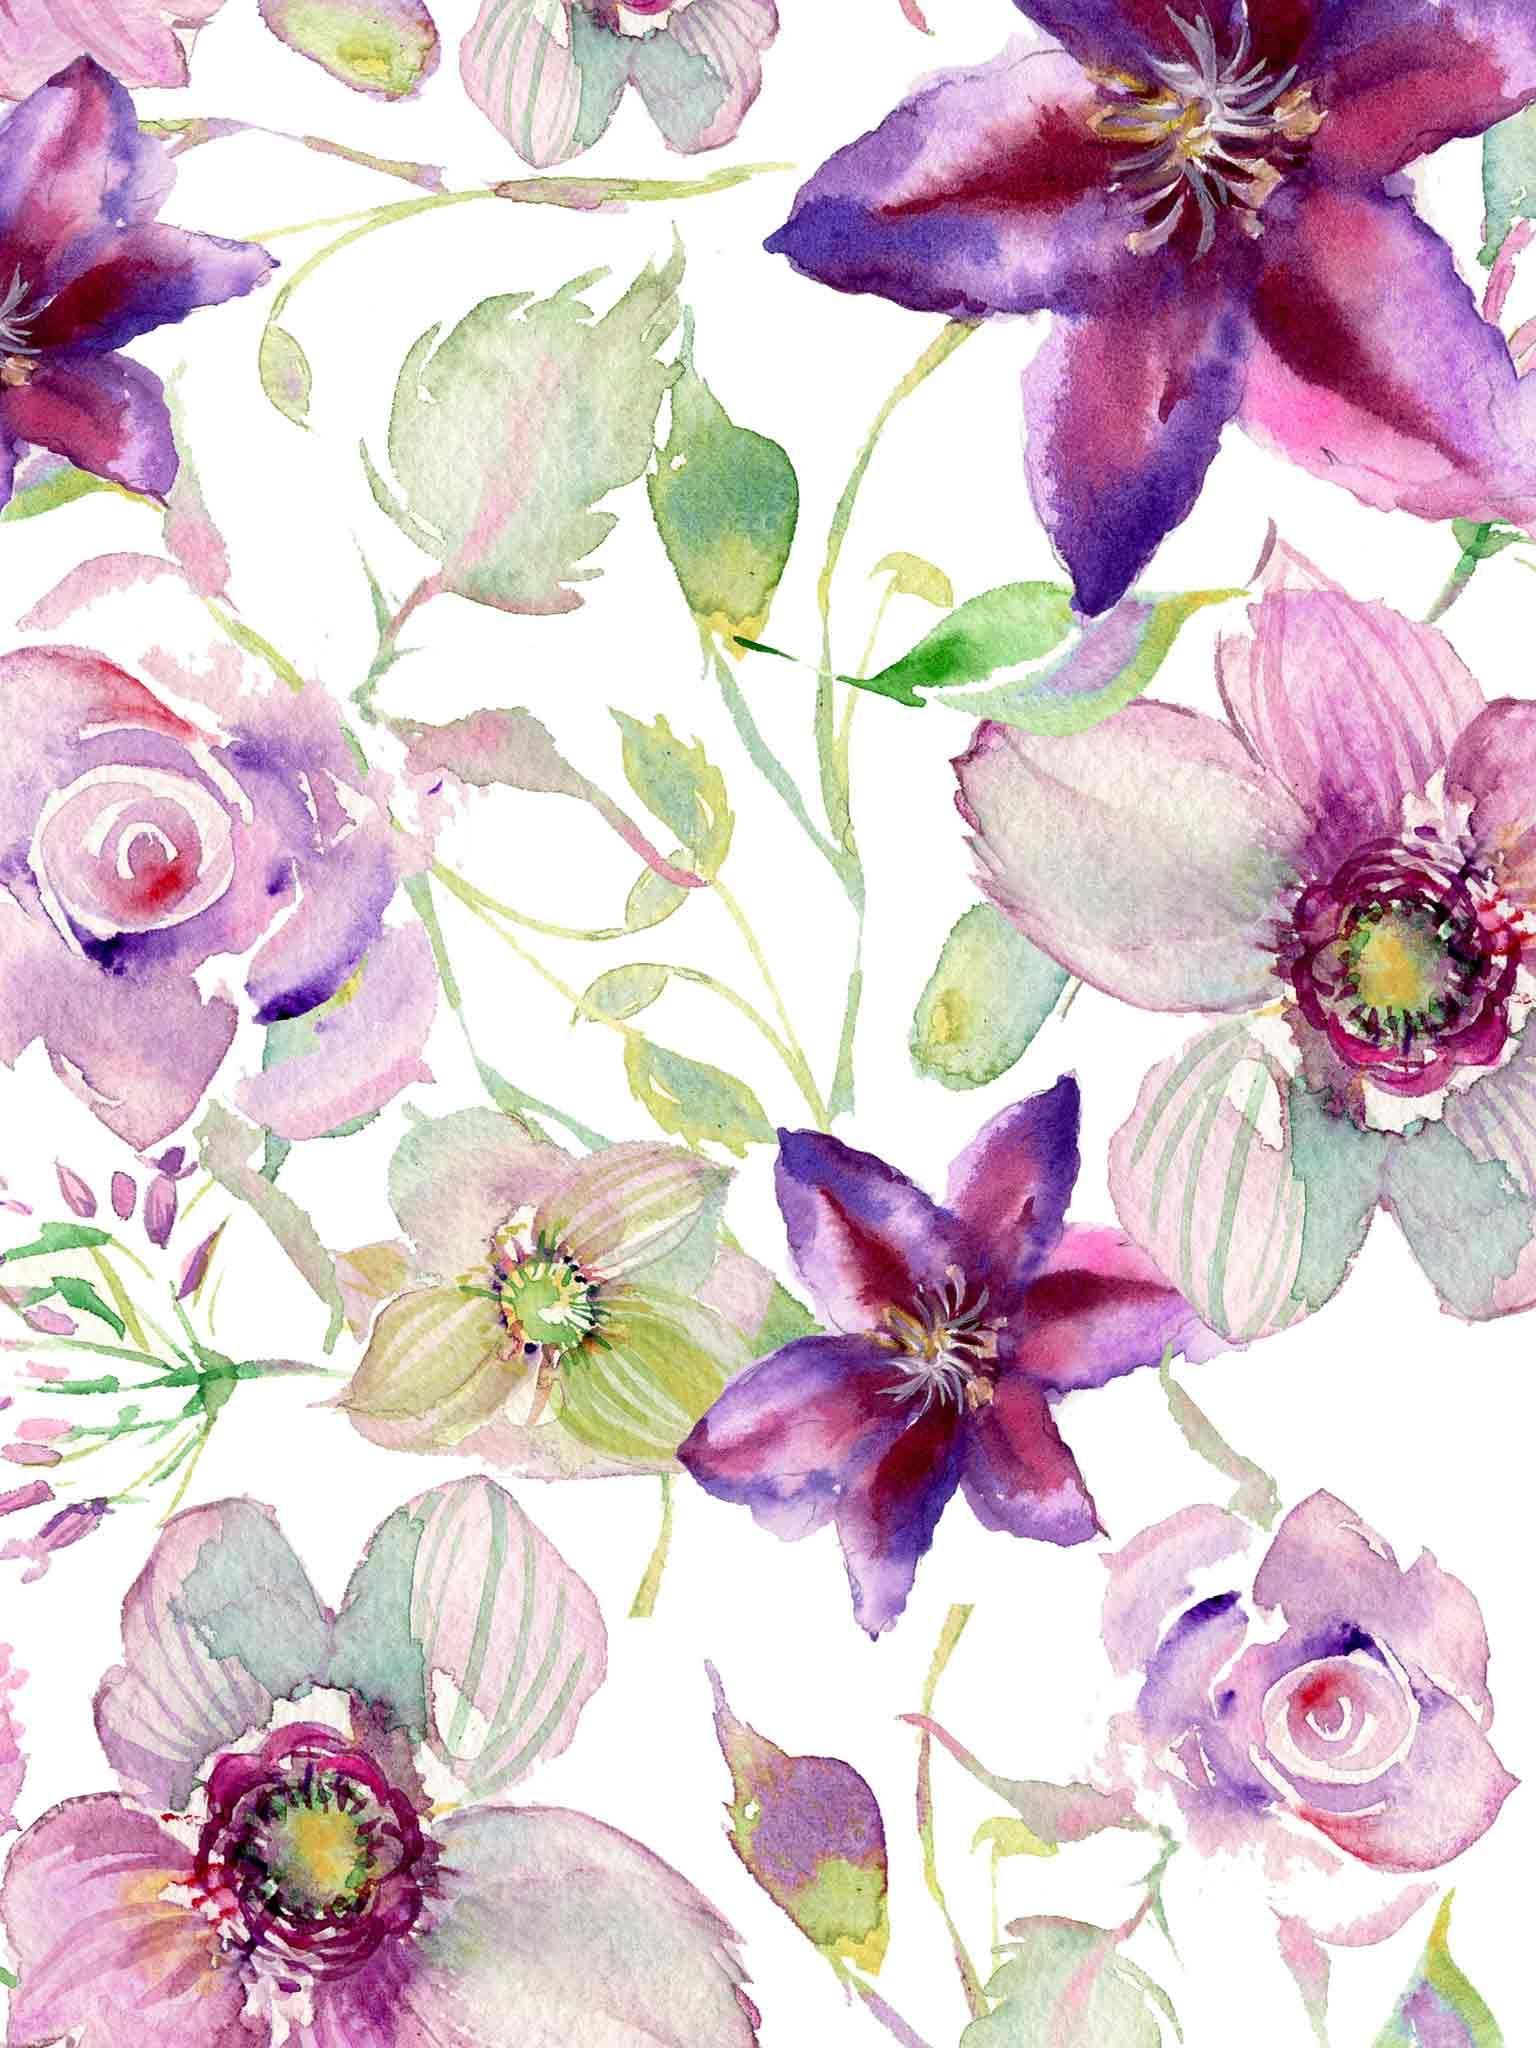 Violet Watercolor Flower Wallpaper Download Ipad Jpg 1536 2048